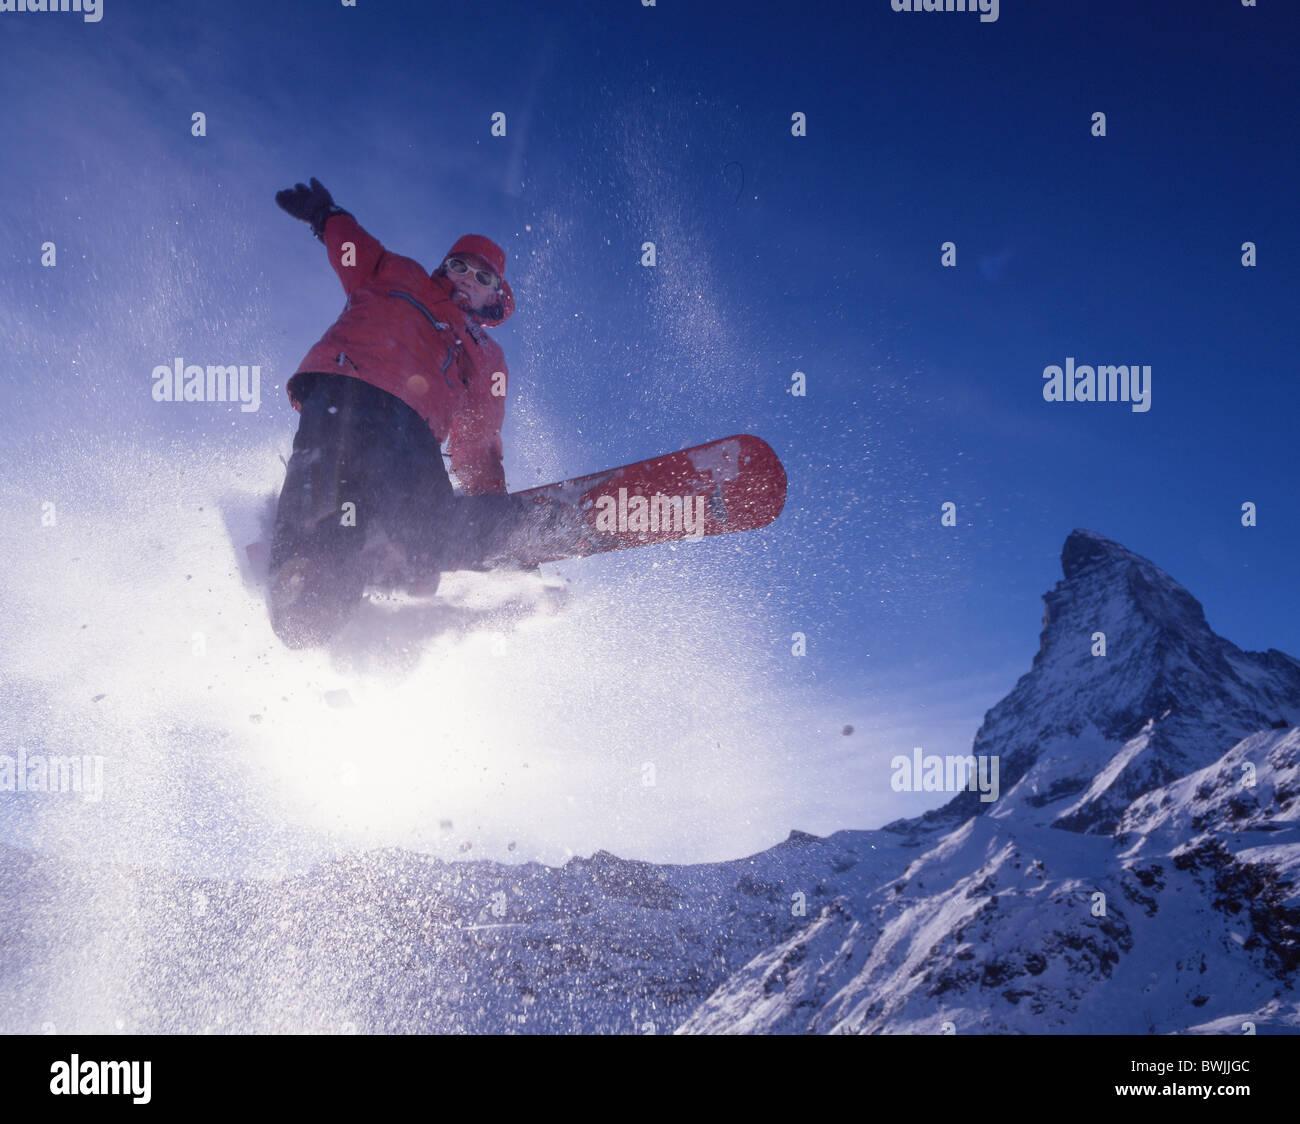 Snowboarder Snowboard Snowboarding Jump Free Riding Winter